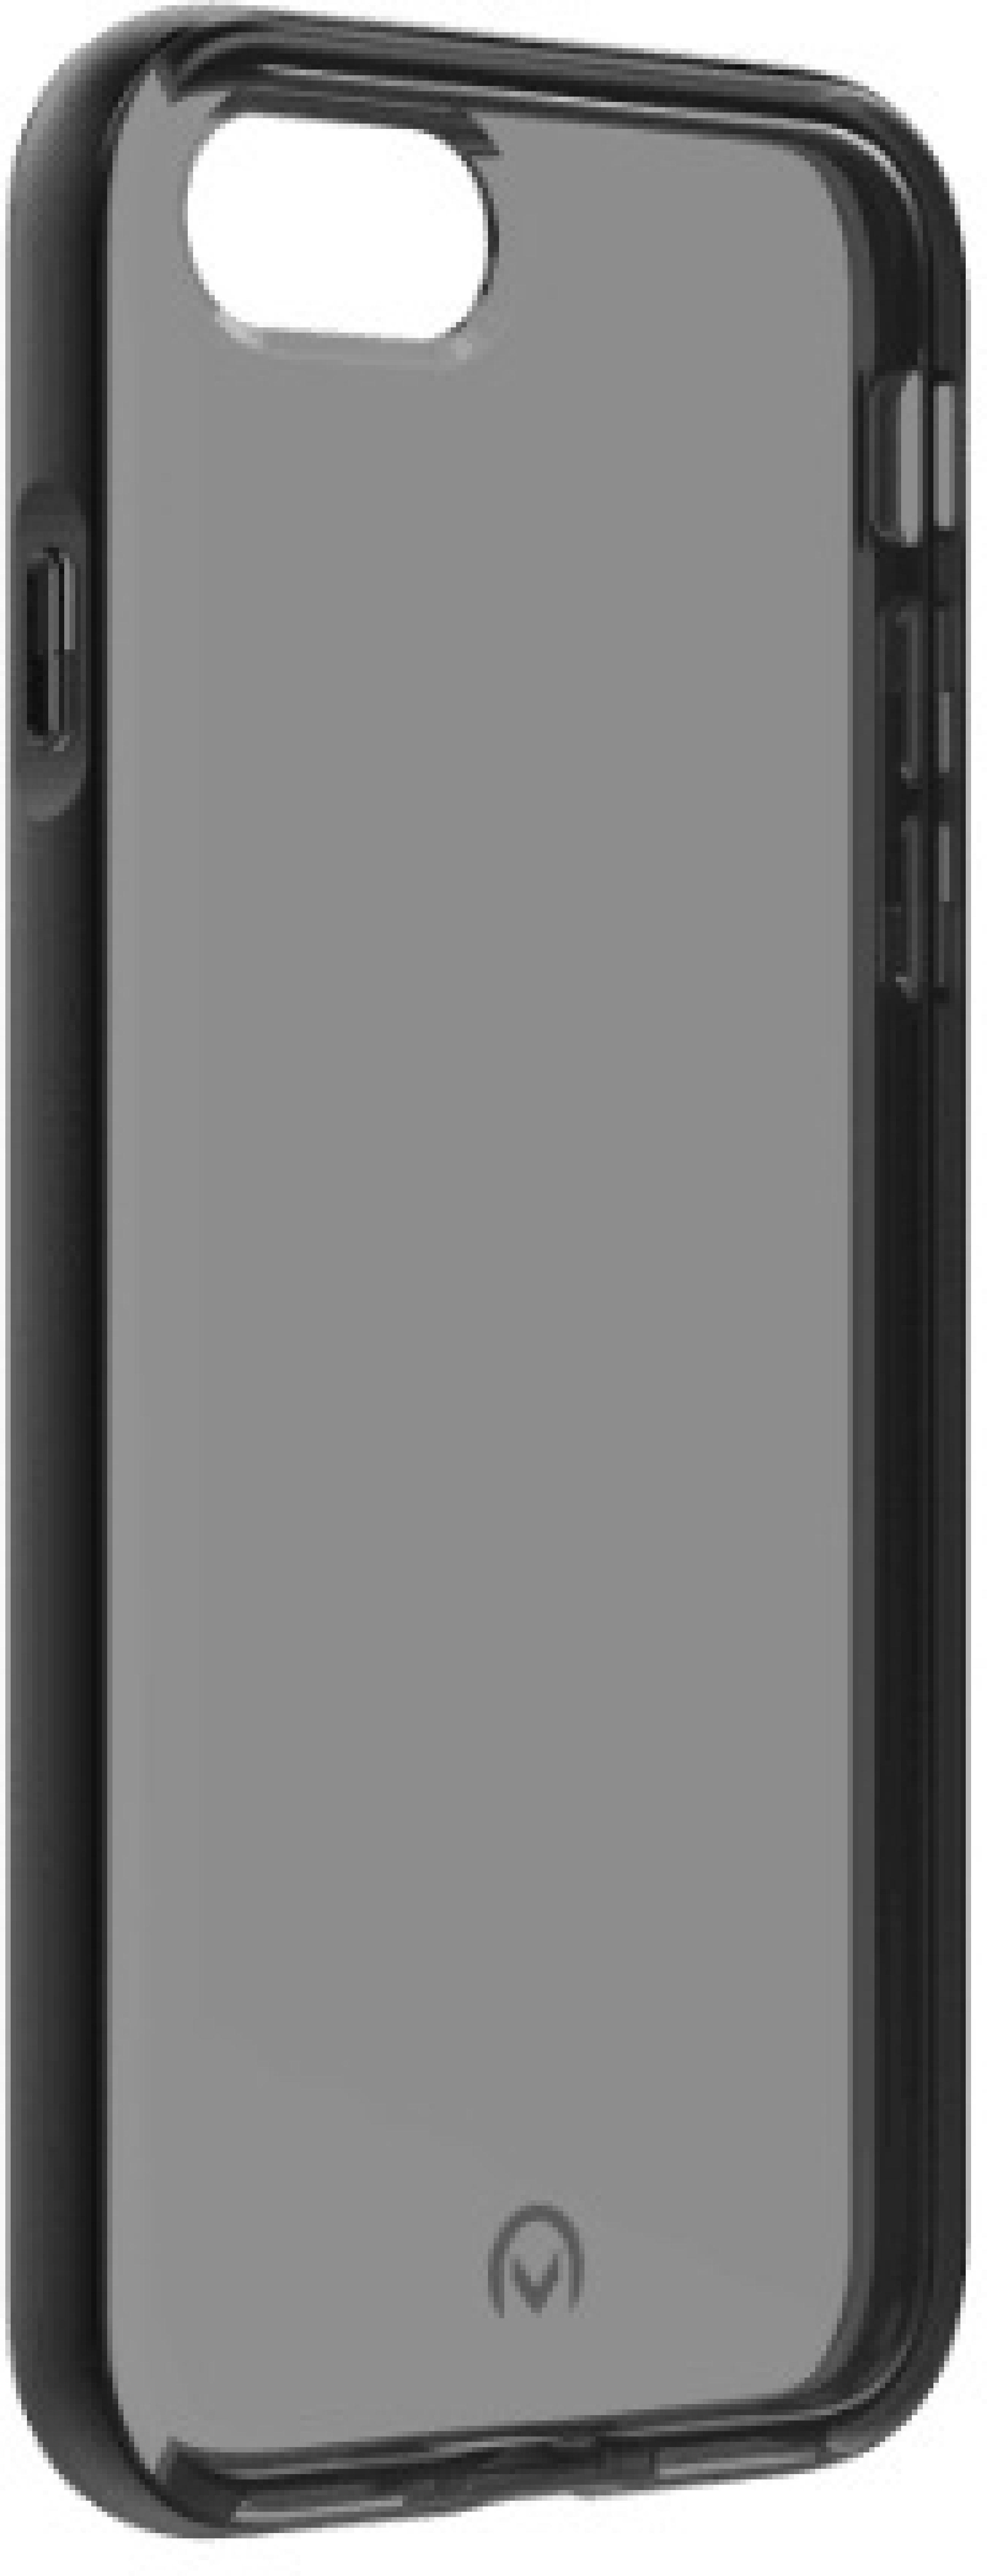 Image of   Telefon Gelly+ Etui Apple iPhone 5 / 5s / SE Grå